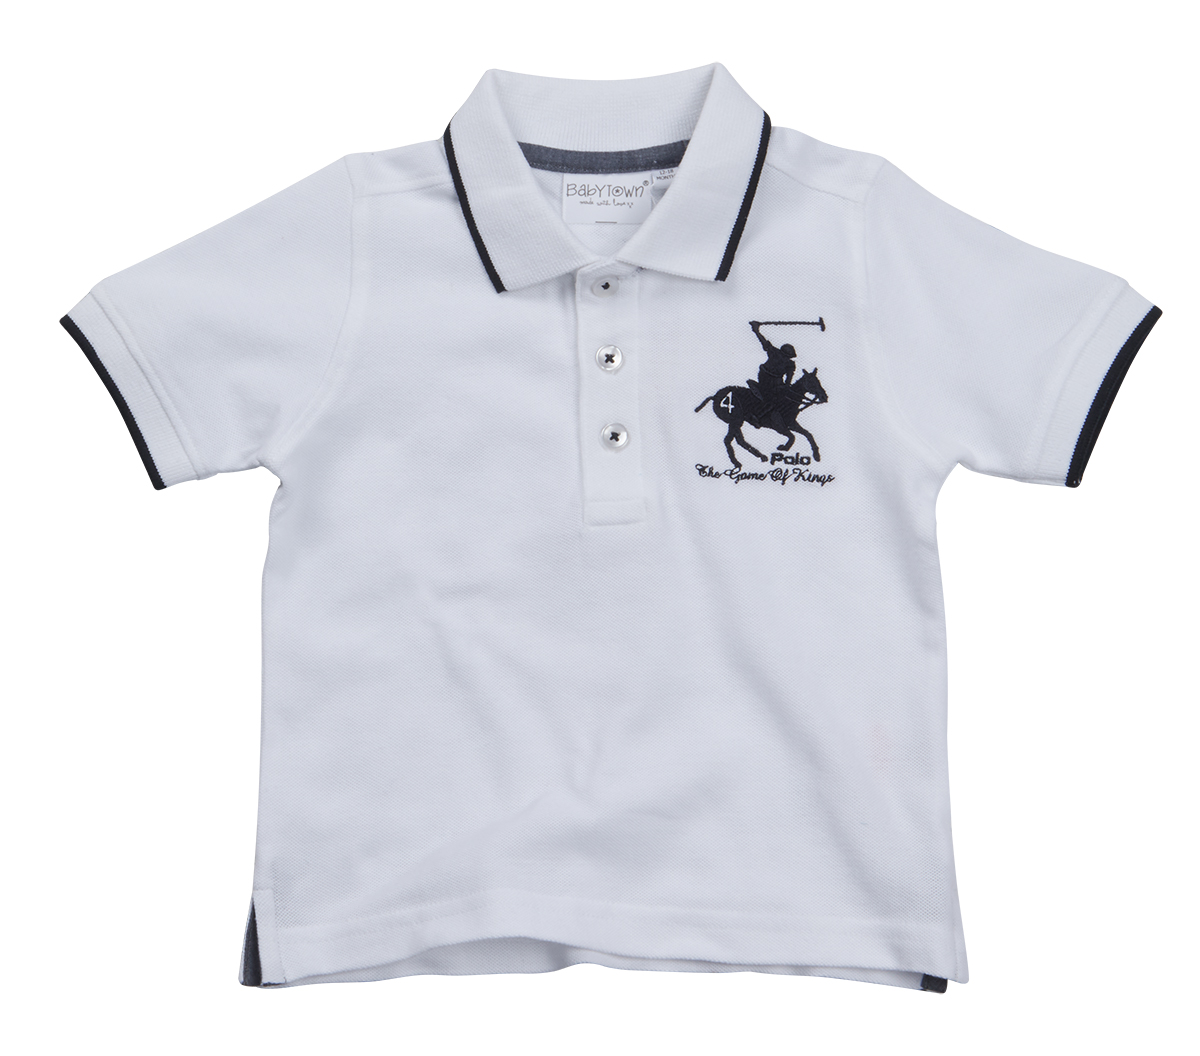 Baby boys polo shirt t shirt summertop short sleeve button for Button collar t shirt